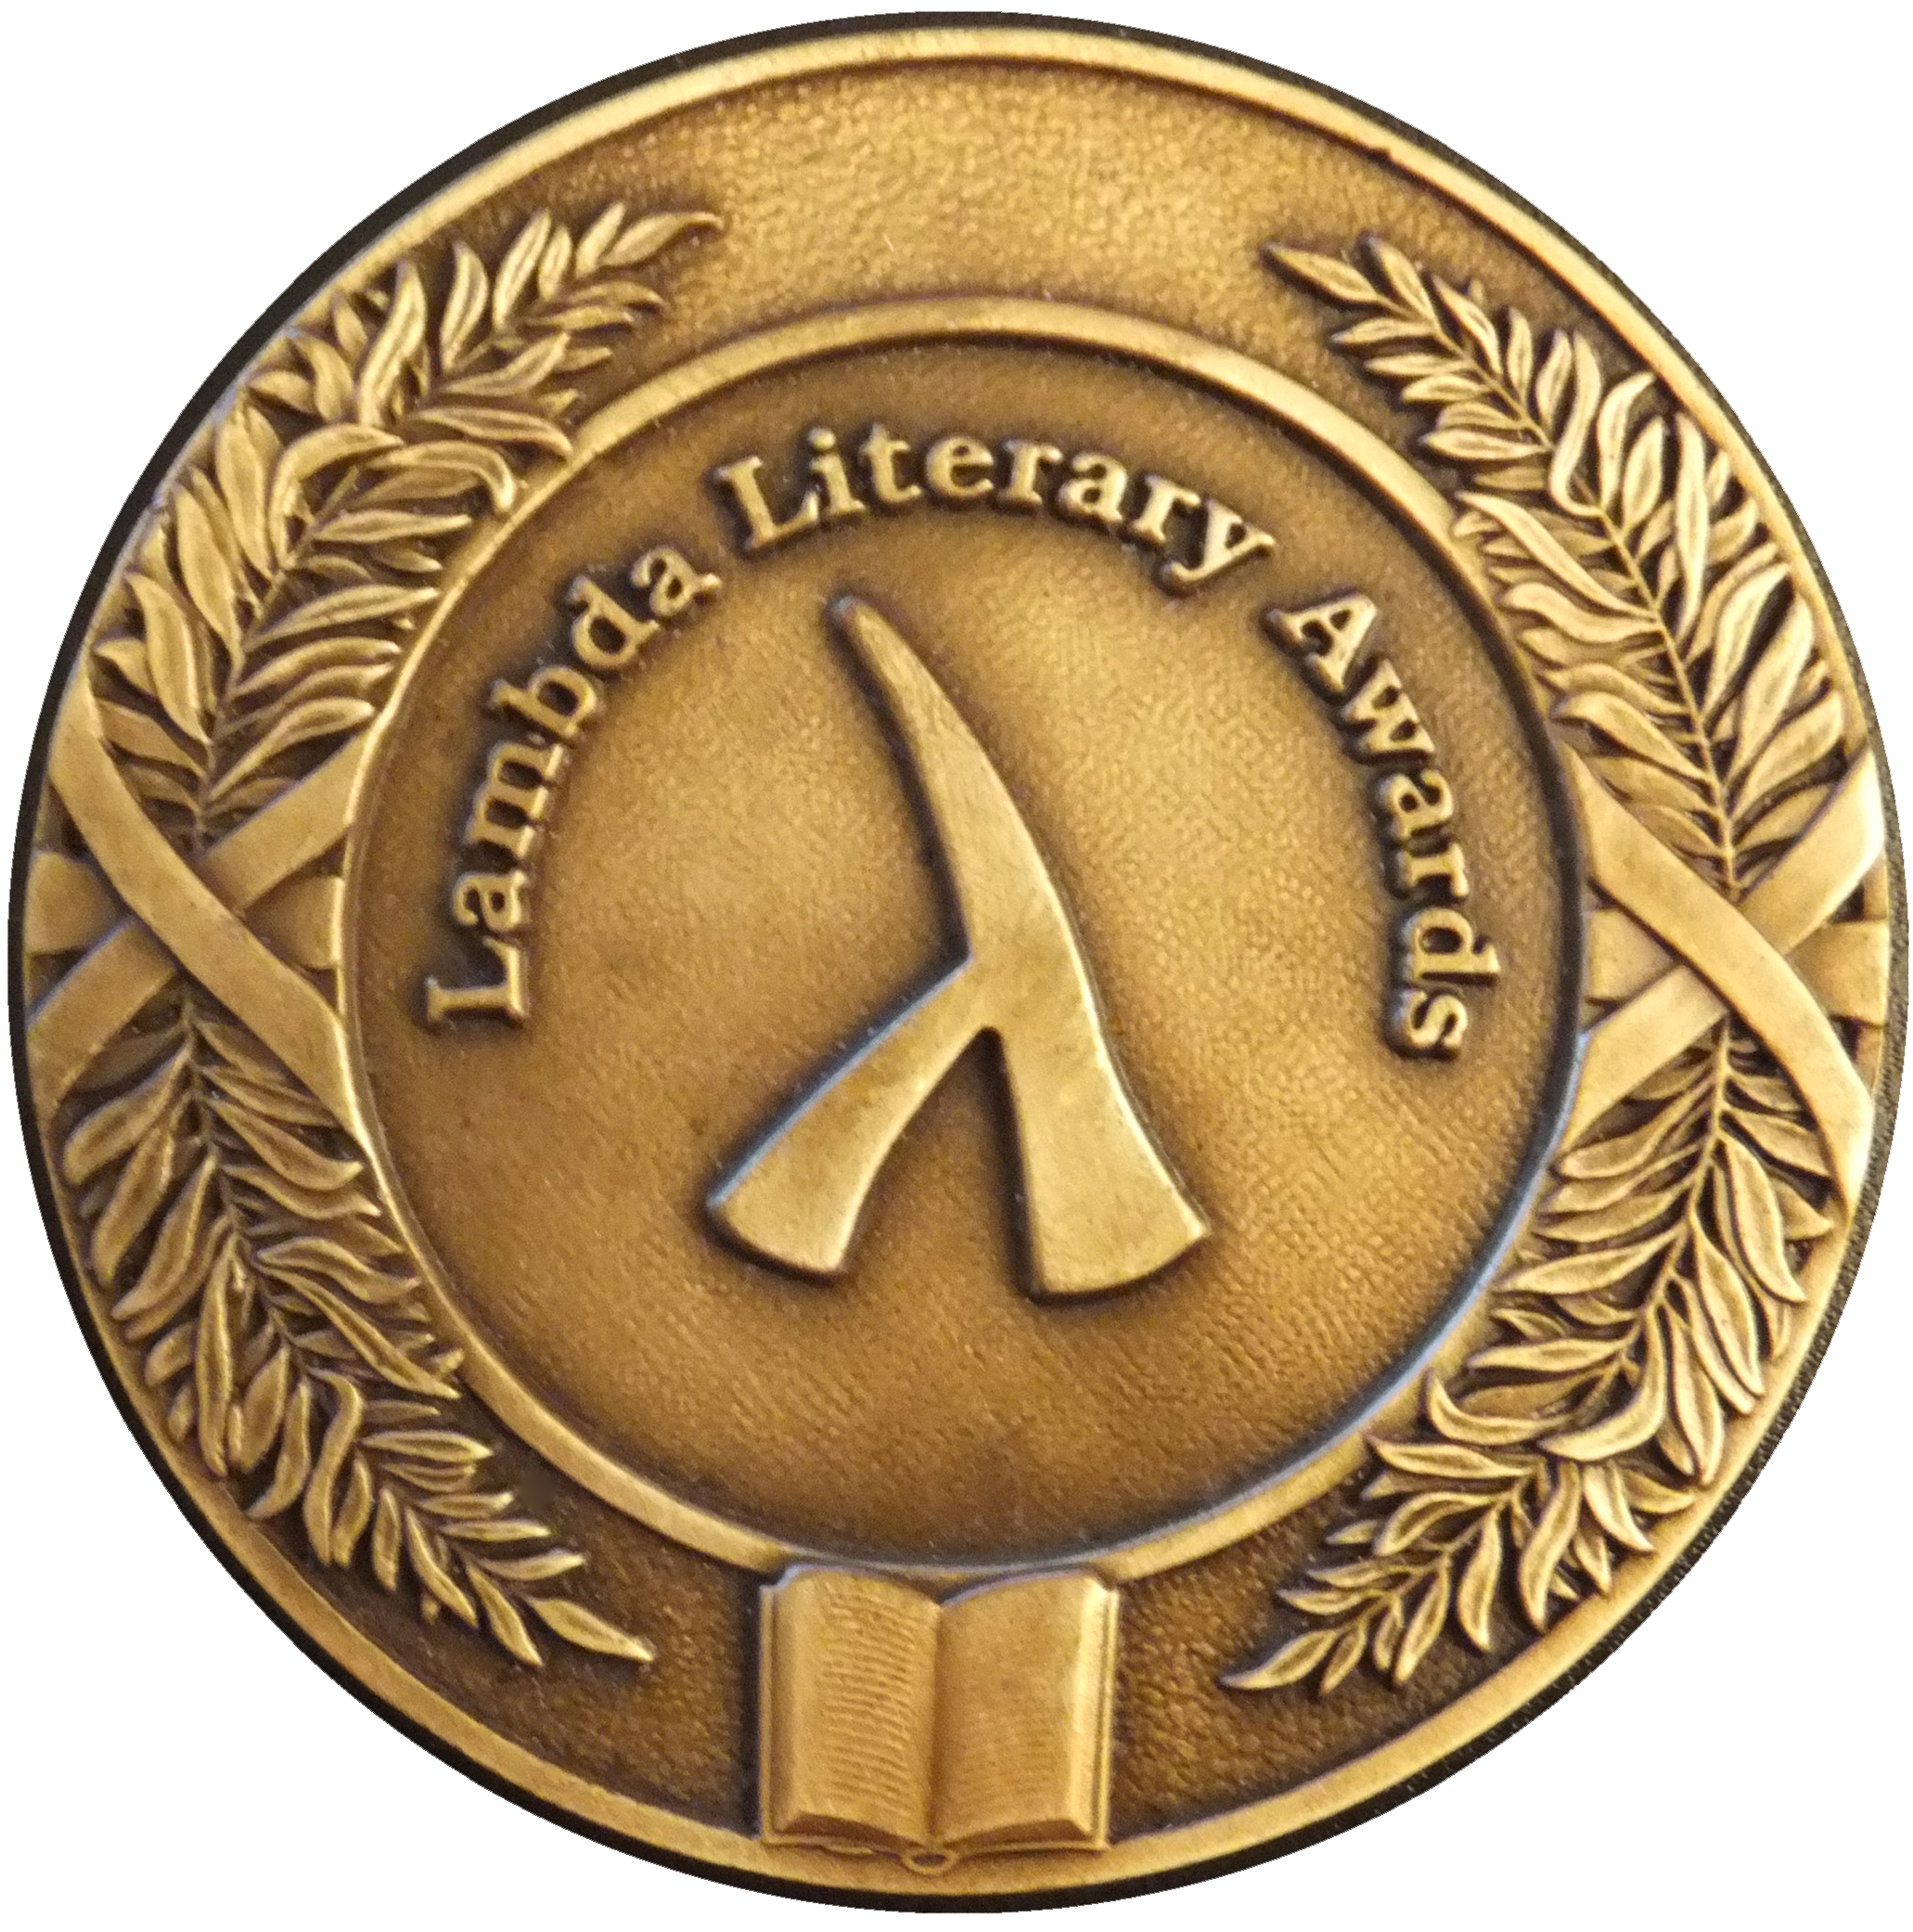 2021 Lambda Literary Award Winners Announced image